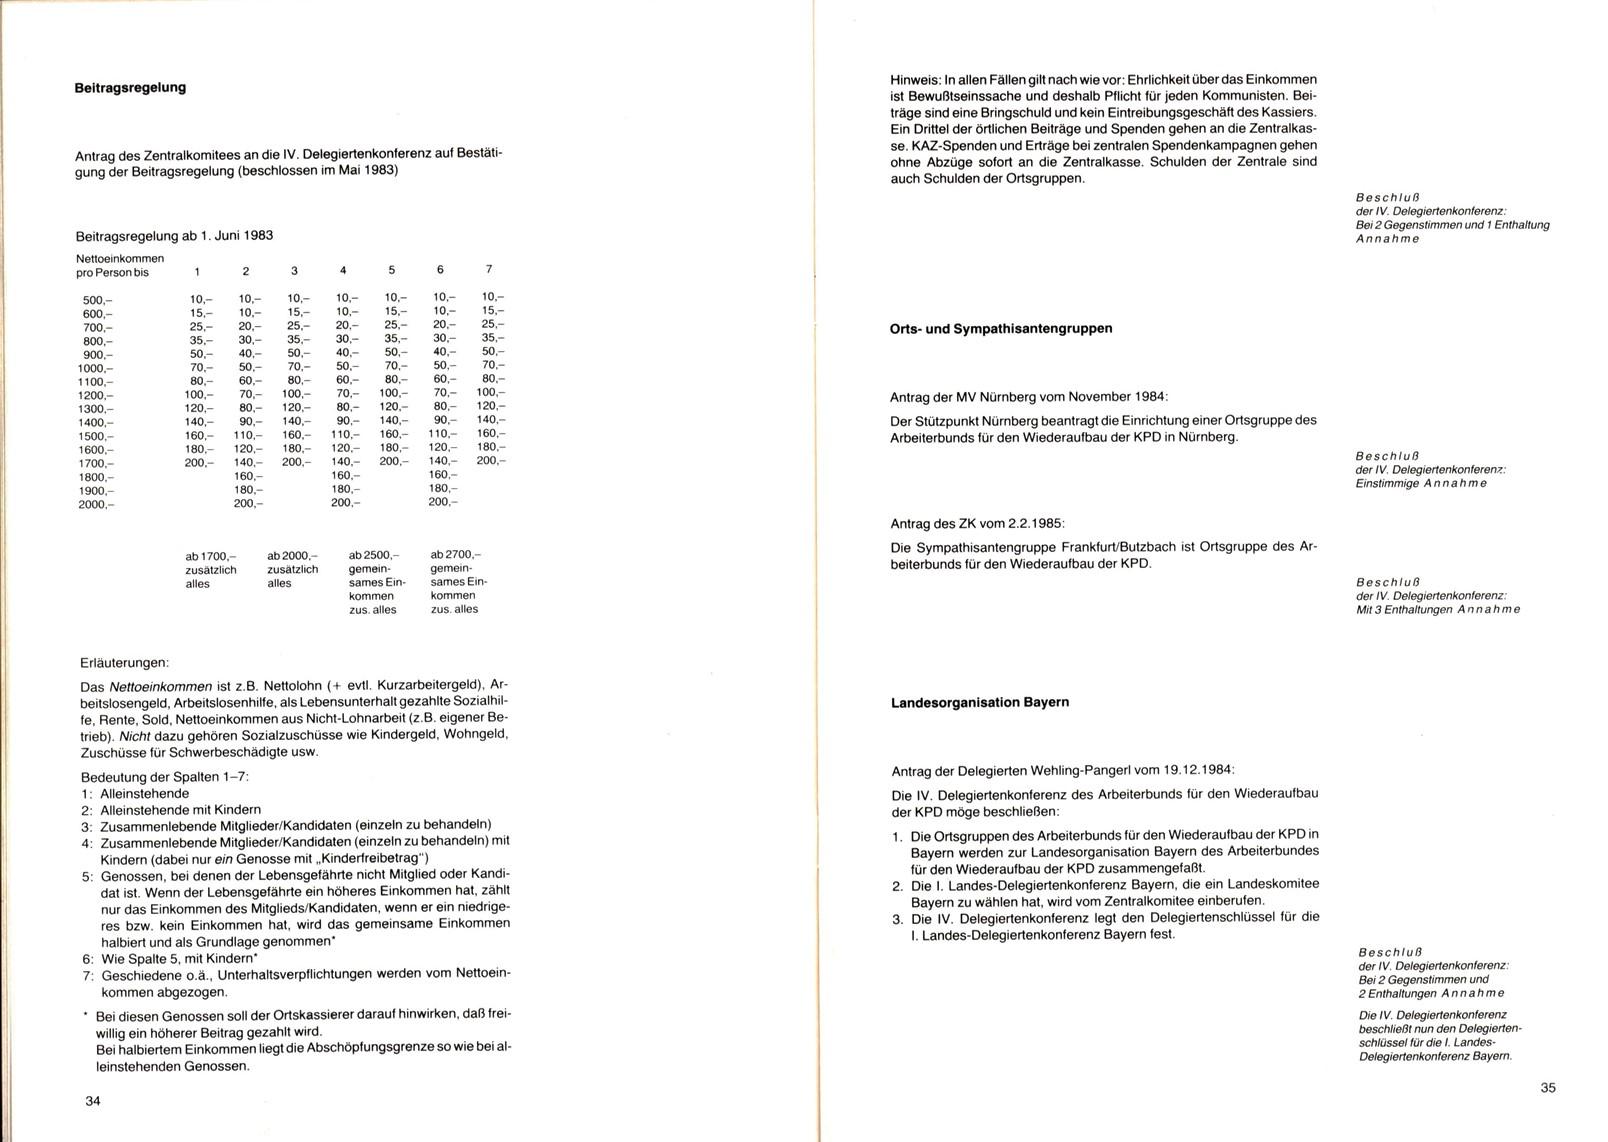 ABG_1985_Beschluesse_IV_Delegiertenkonferenz_19